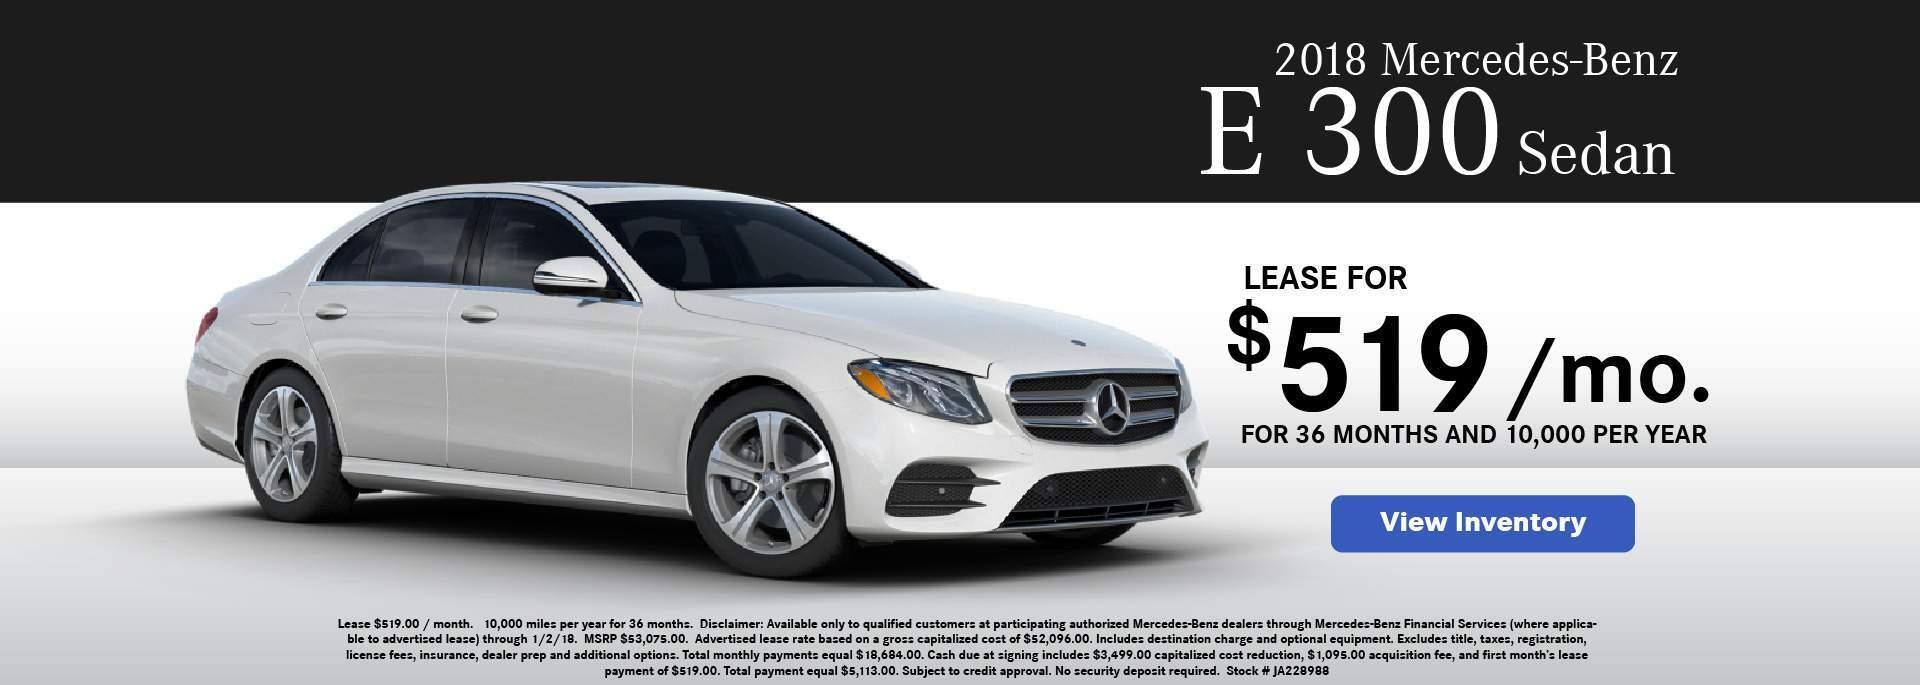 Mercedes cla lease deals miami lamoureph blog for Mercedes benz lease offers